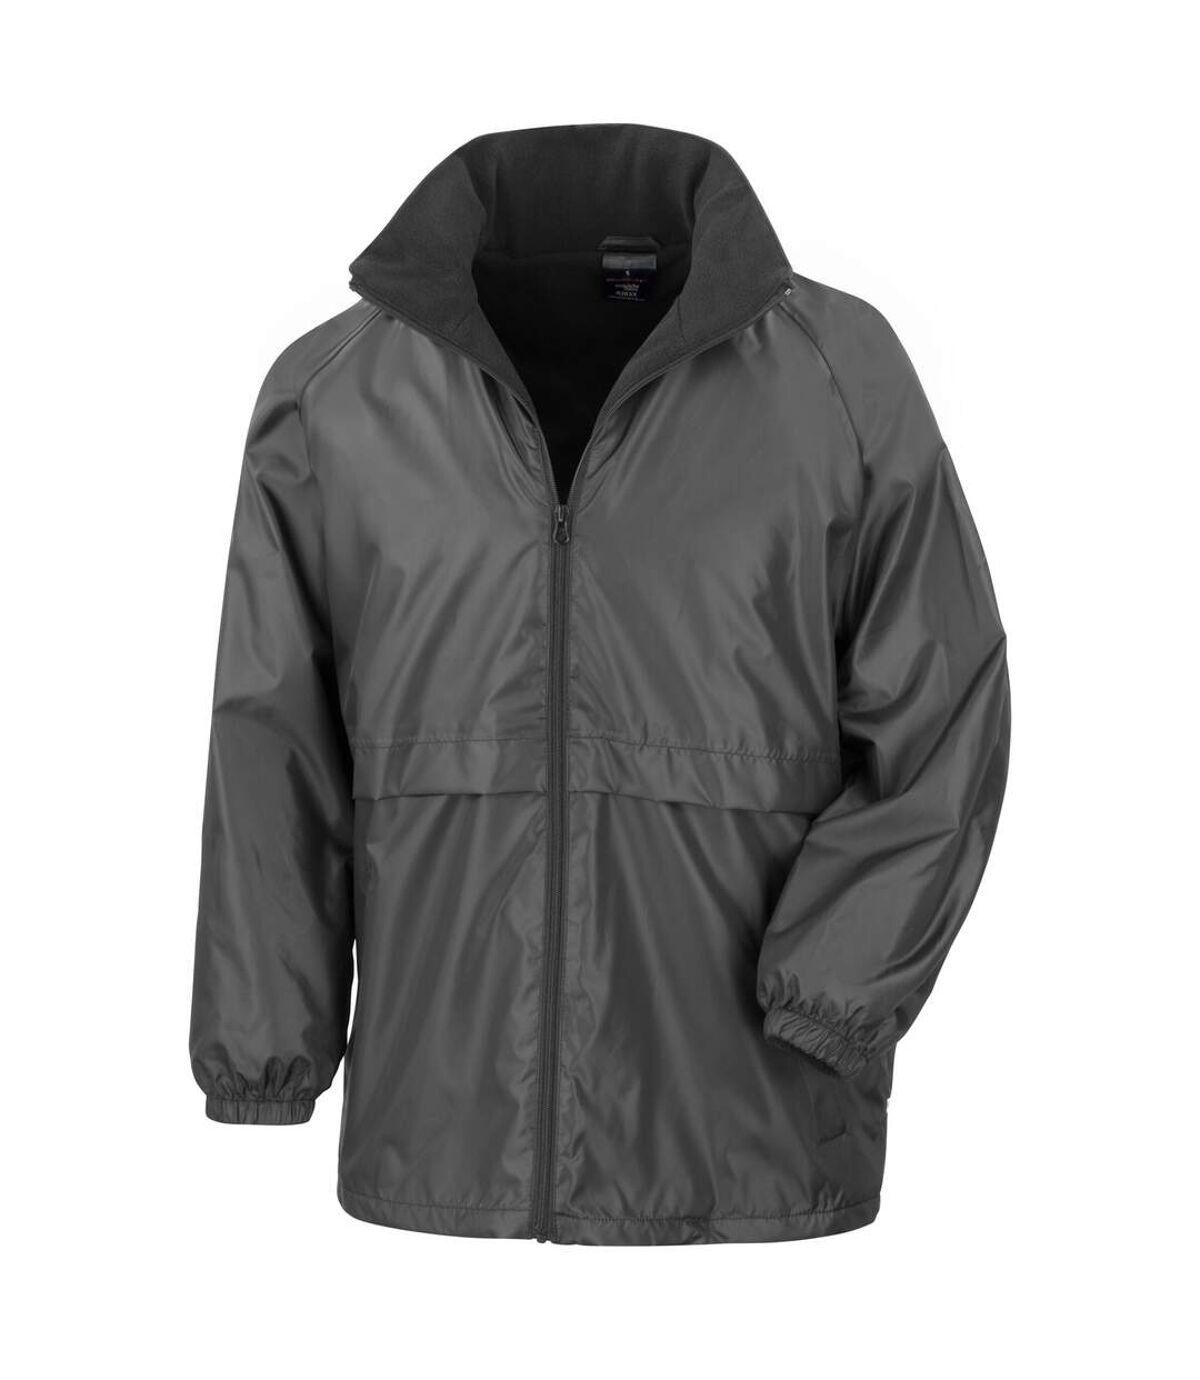 Result Mens Core Adult DWL Jacket (With Fold Away Hood) (Black) - UTBC896